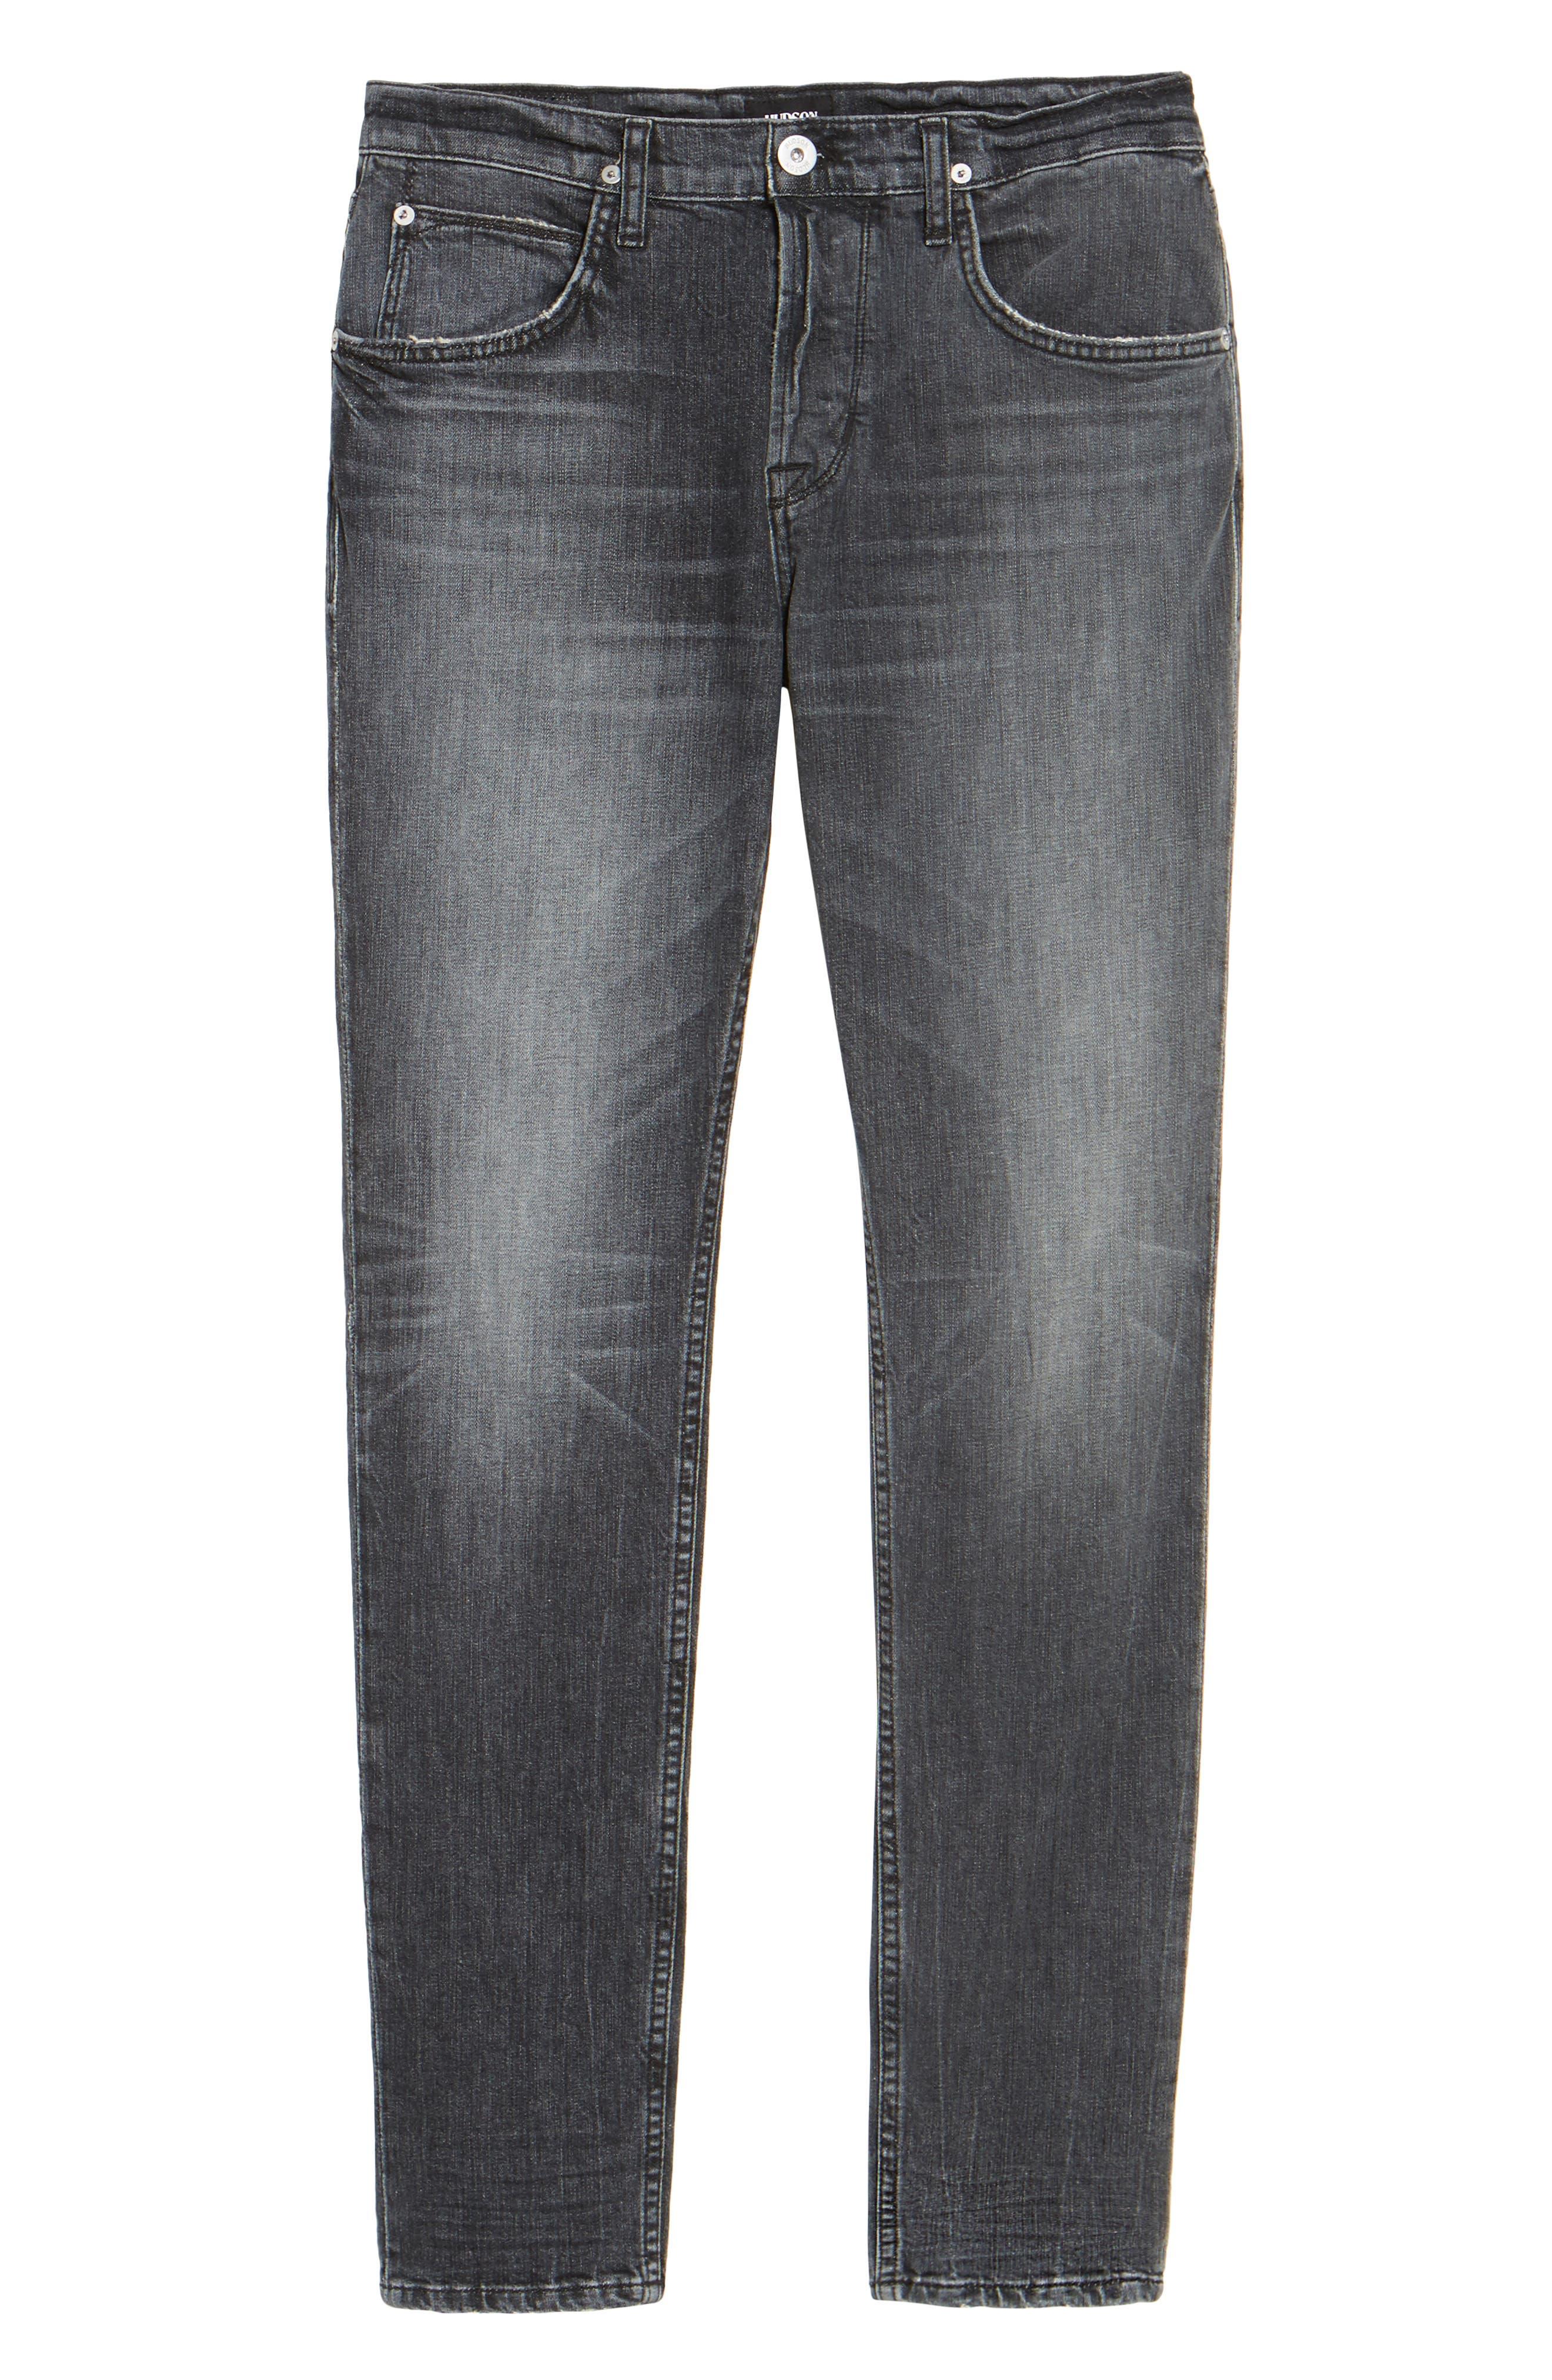 Axl Skinny Fit Jeans,                             Alternate thumbnail 6, color,                             Venture